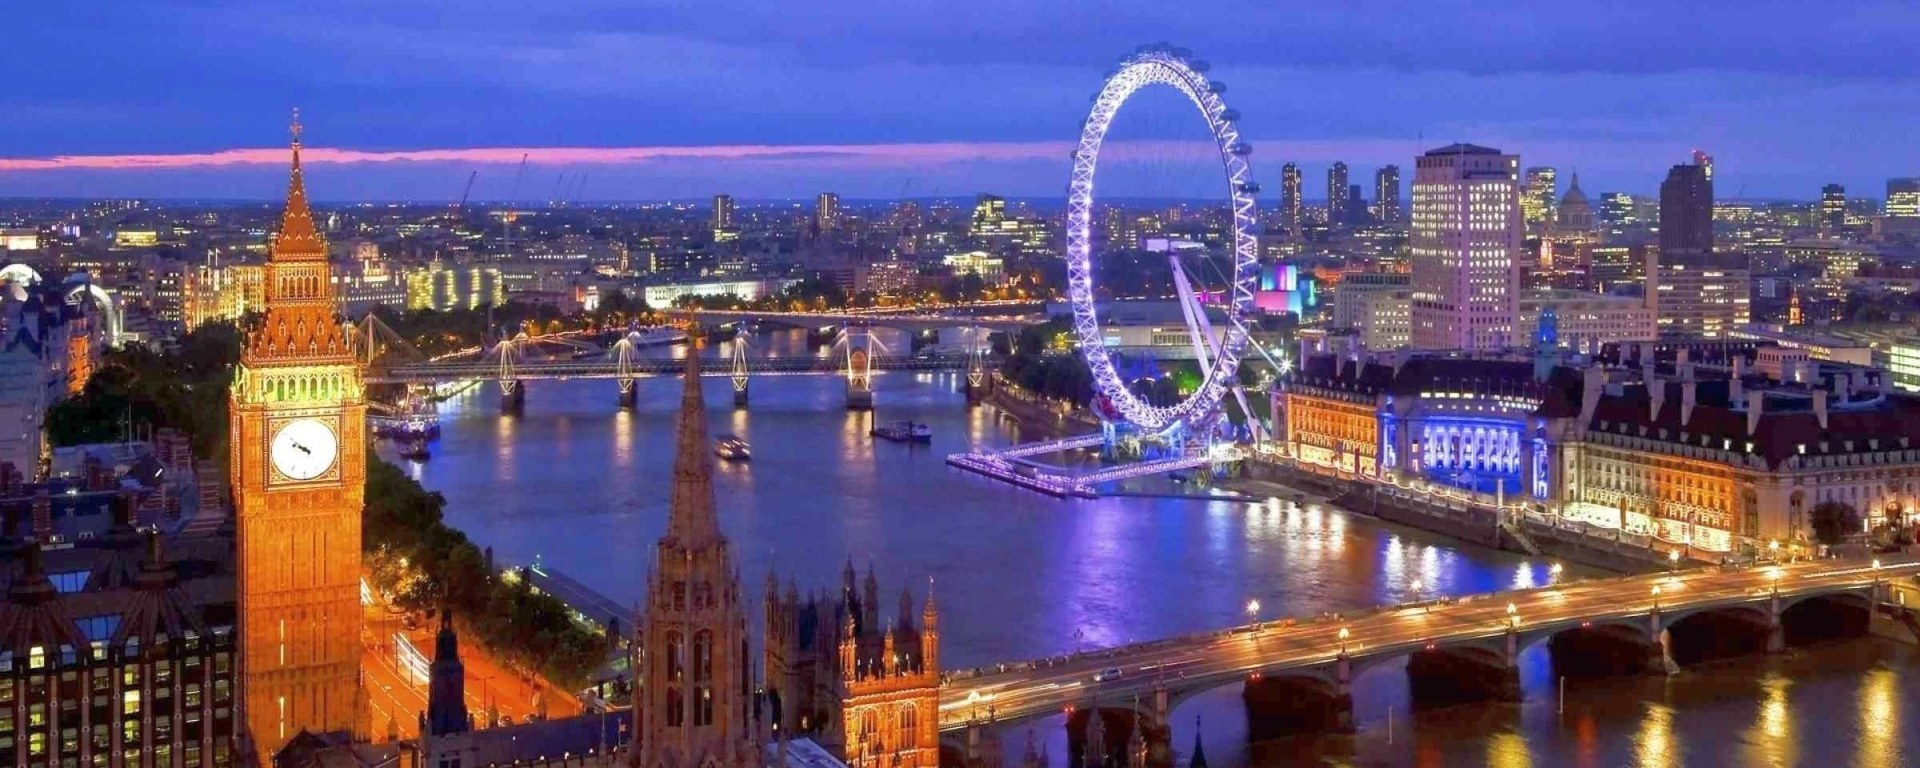 london-night-tour